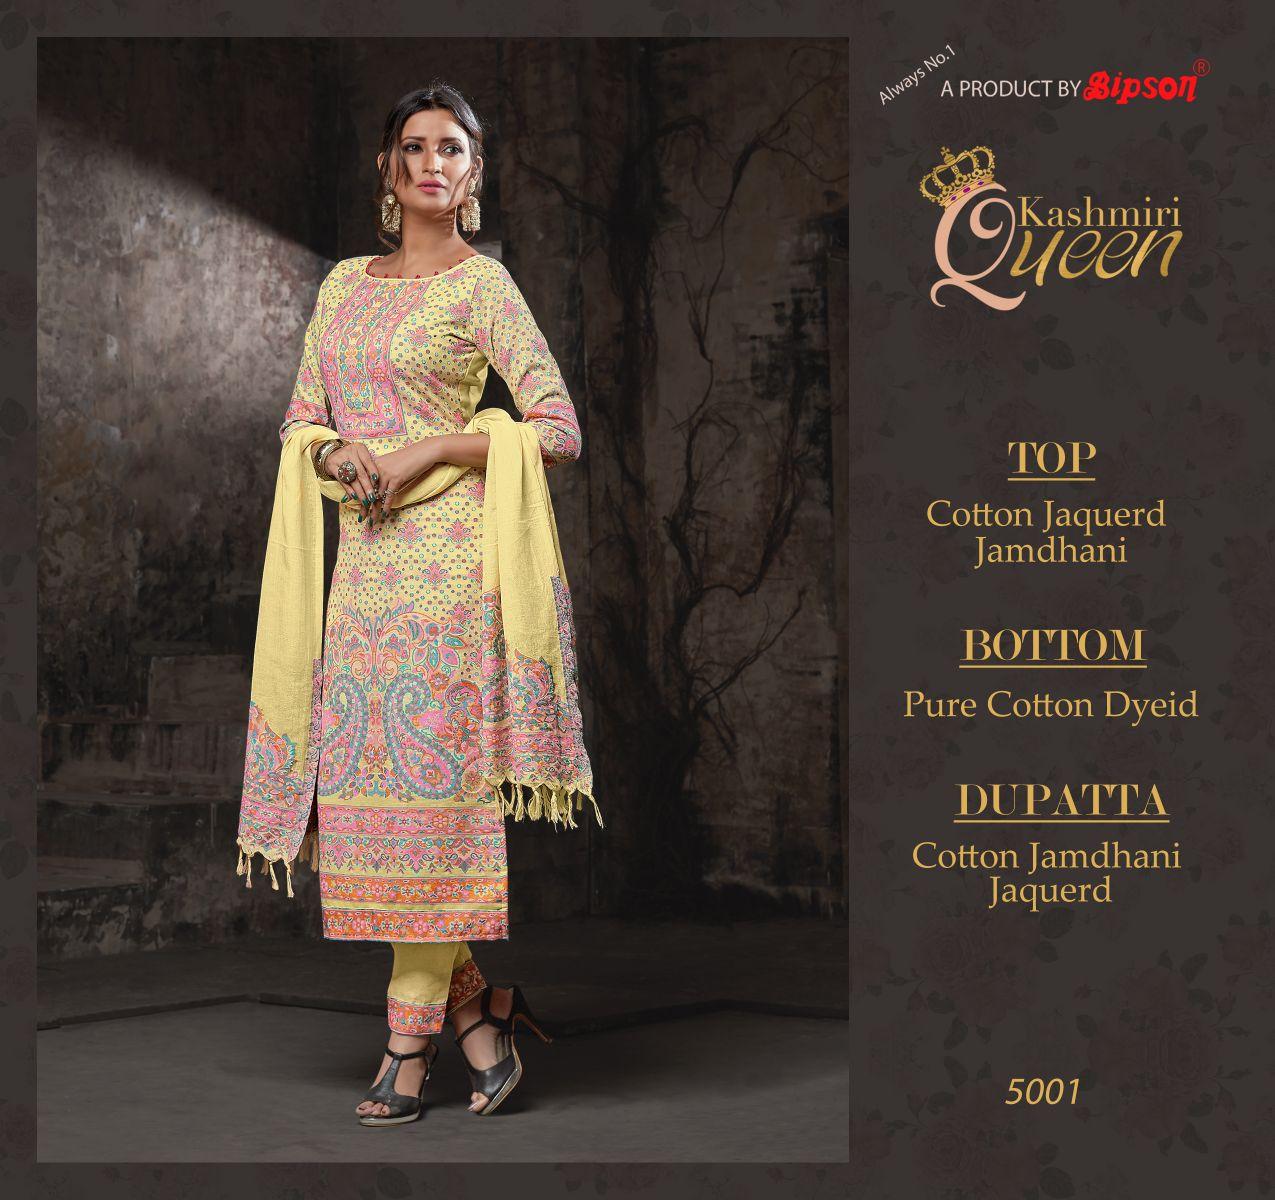 Bipson Kashmiri Queen 5001